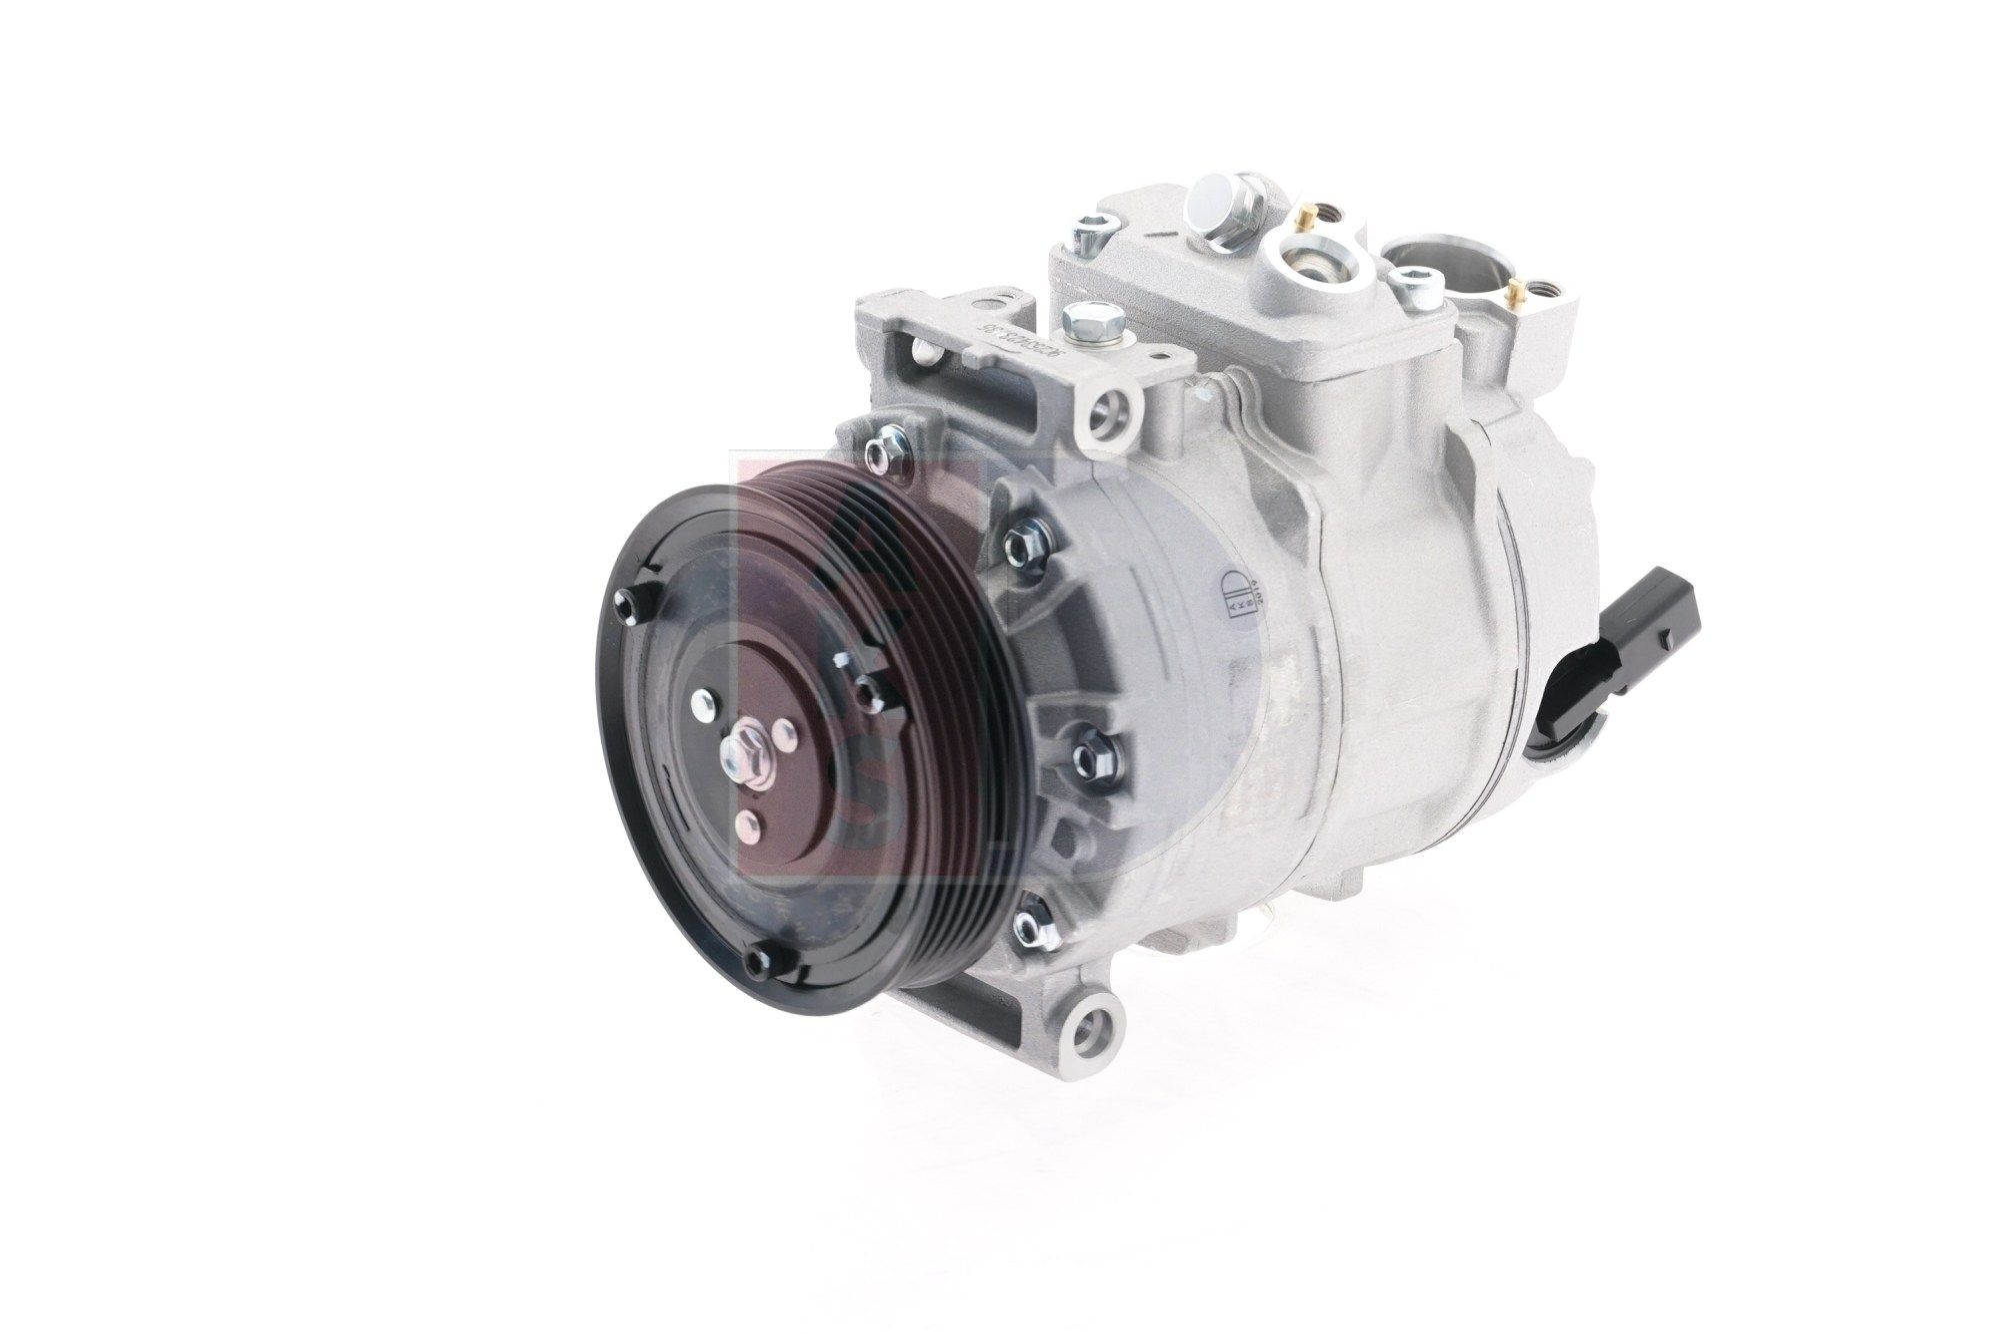 850682N Klimakompressor AKS DASIS Test